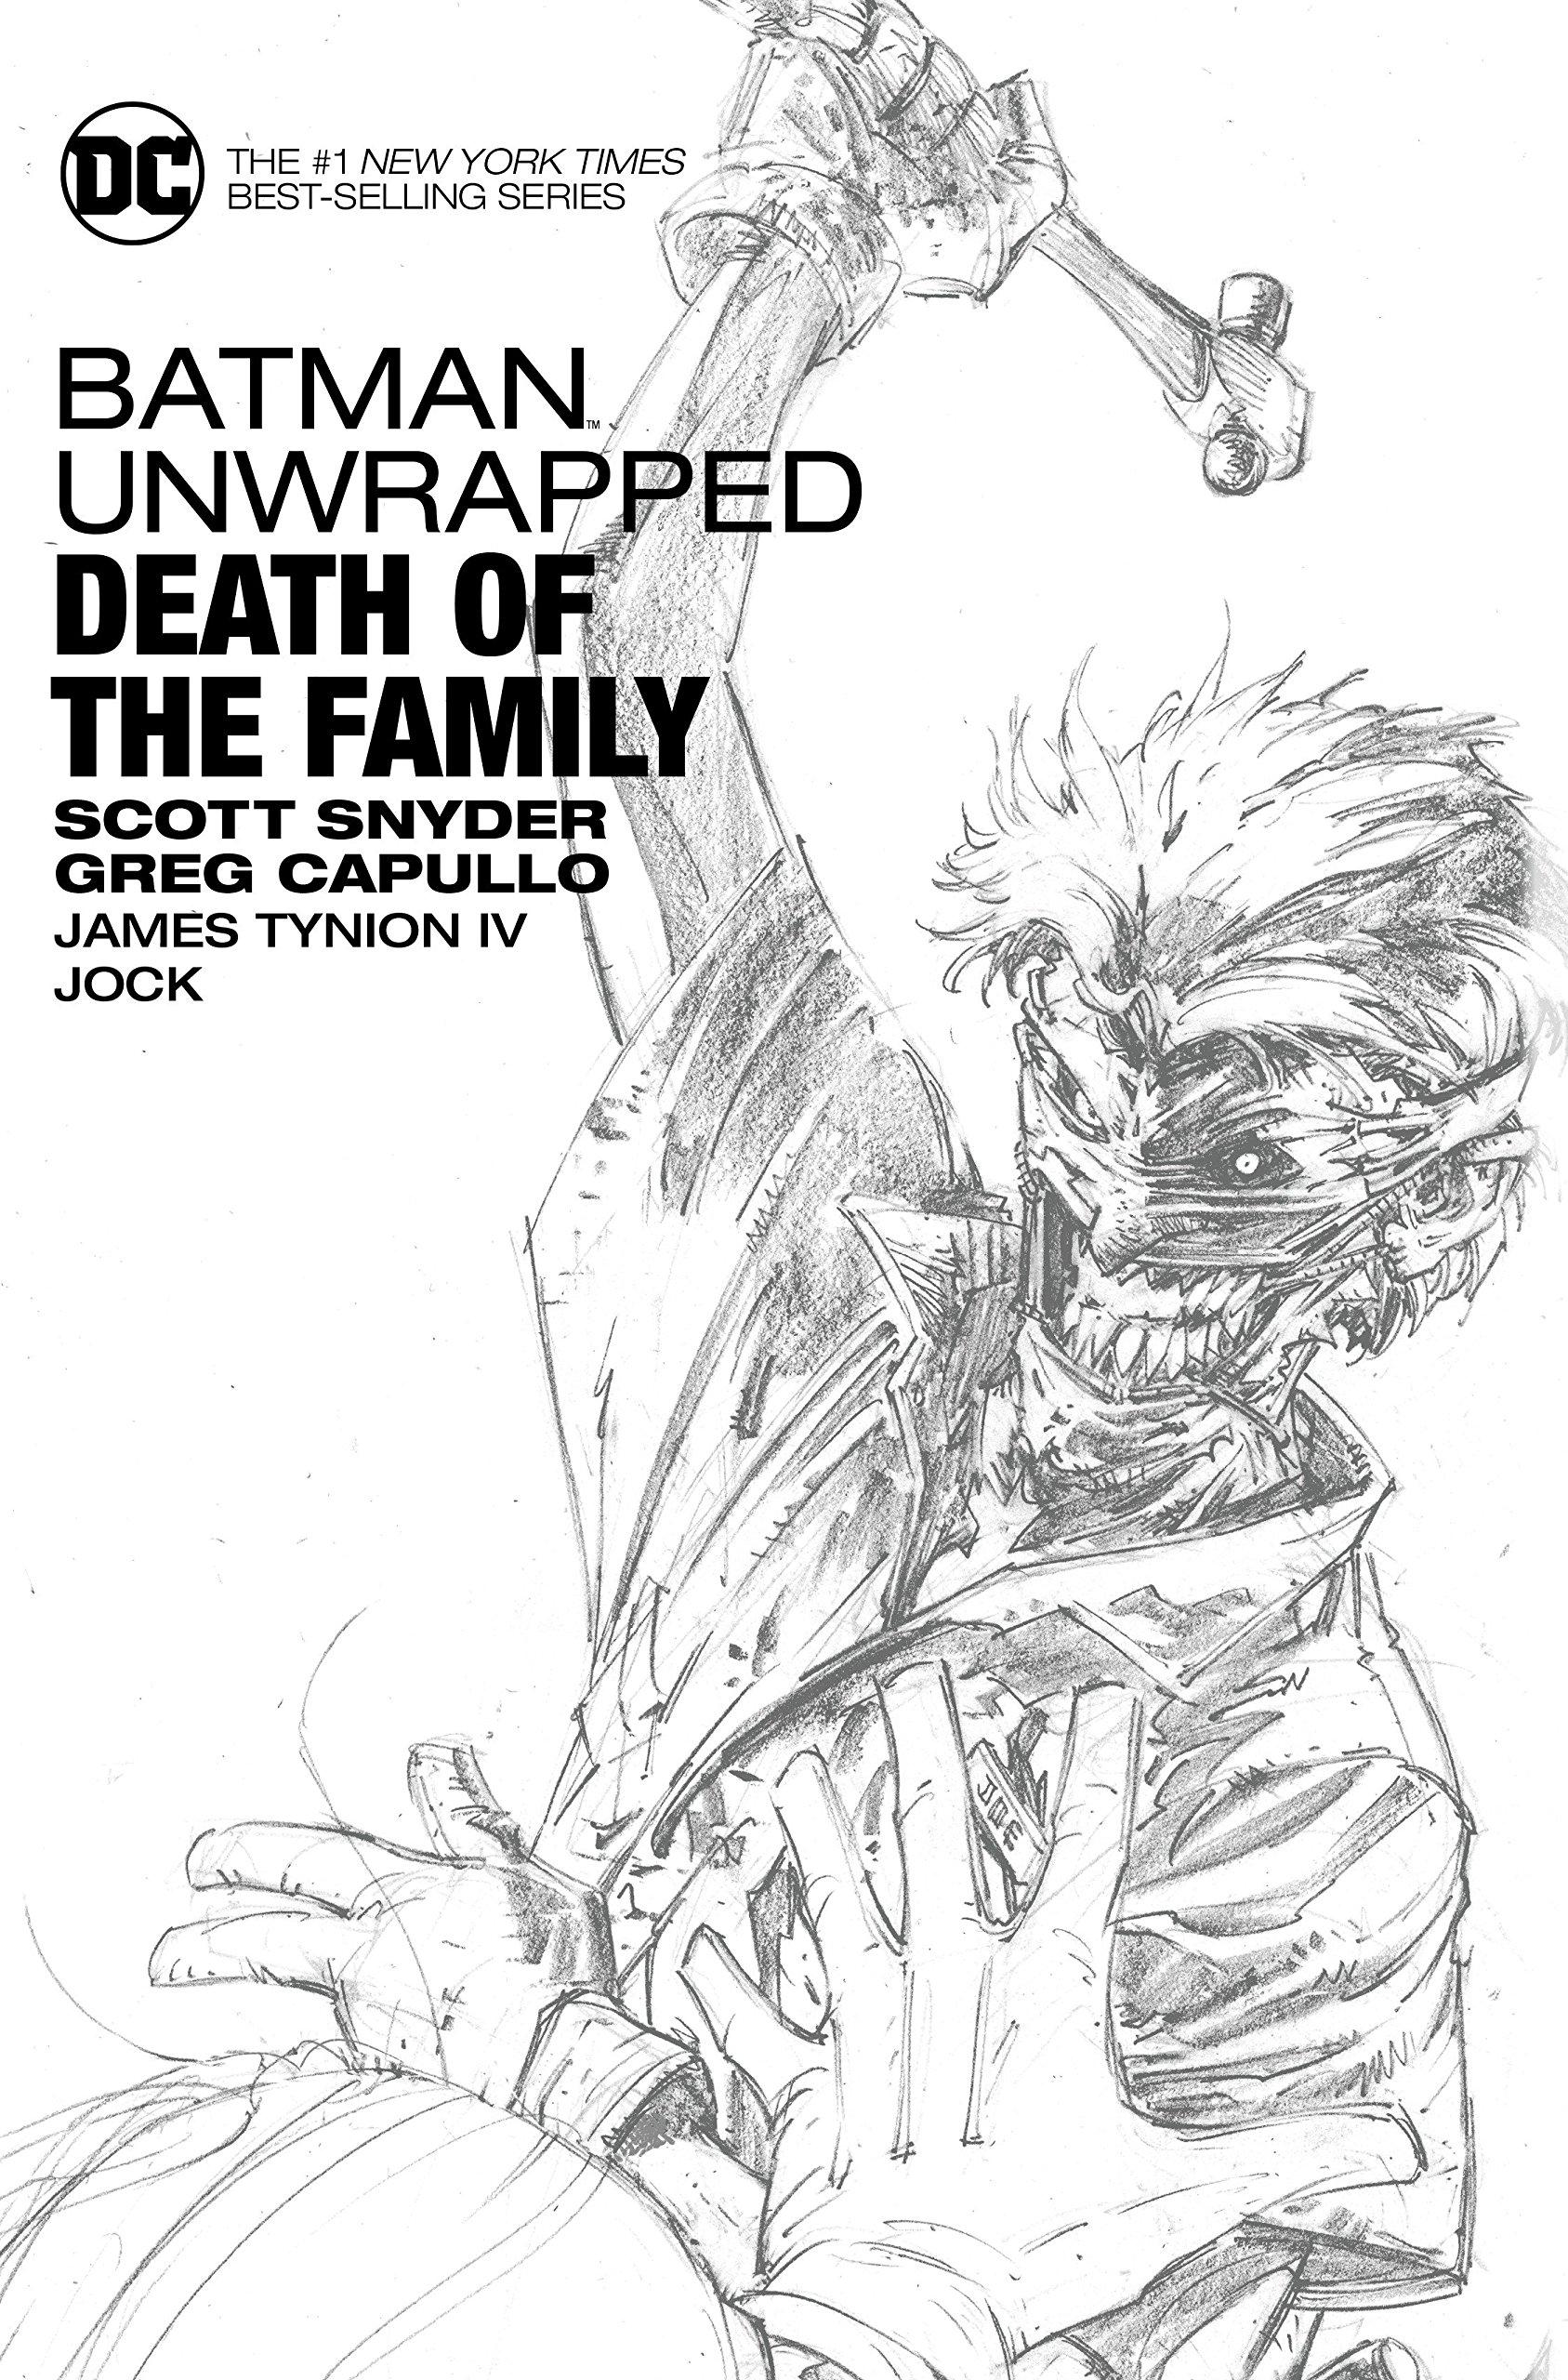 Amazon batman unwrapped death of the family 9781401274887 amazon batman unwrapped death of the family 9781401274887 scott snyder greg capullo books fandeluxe Choice Image